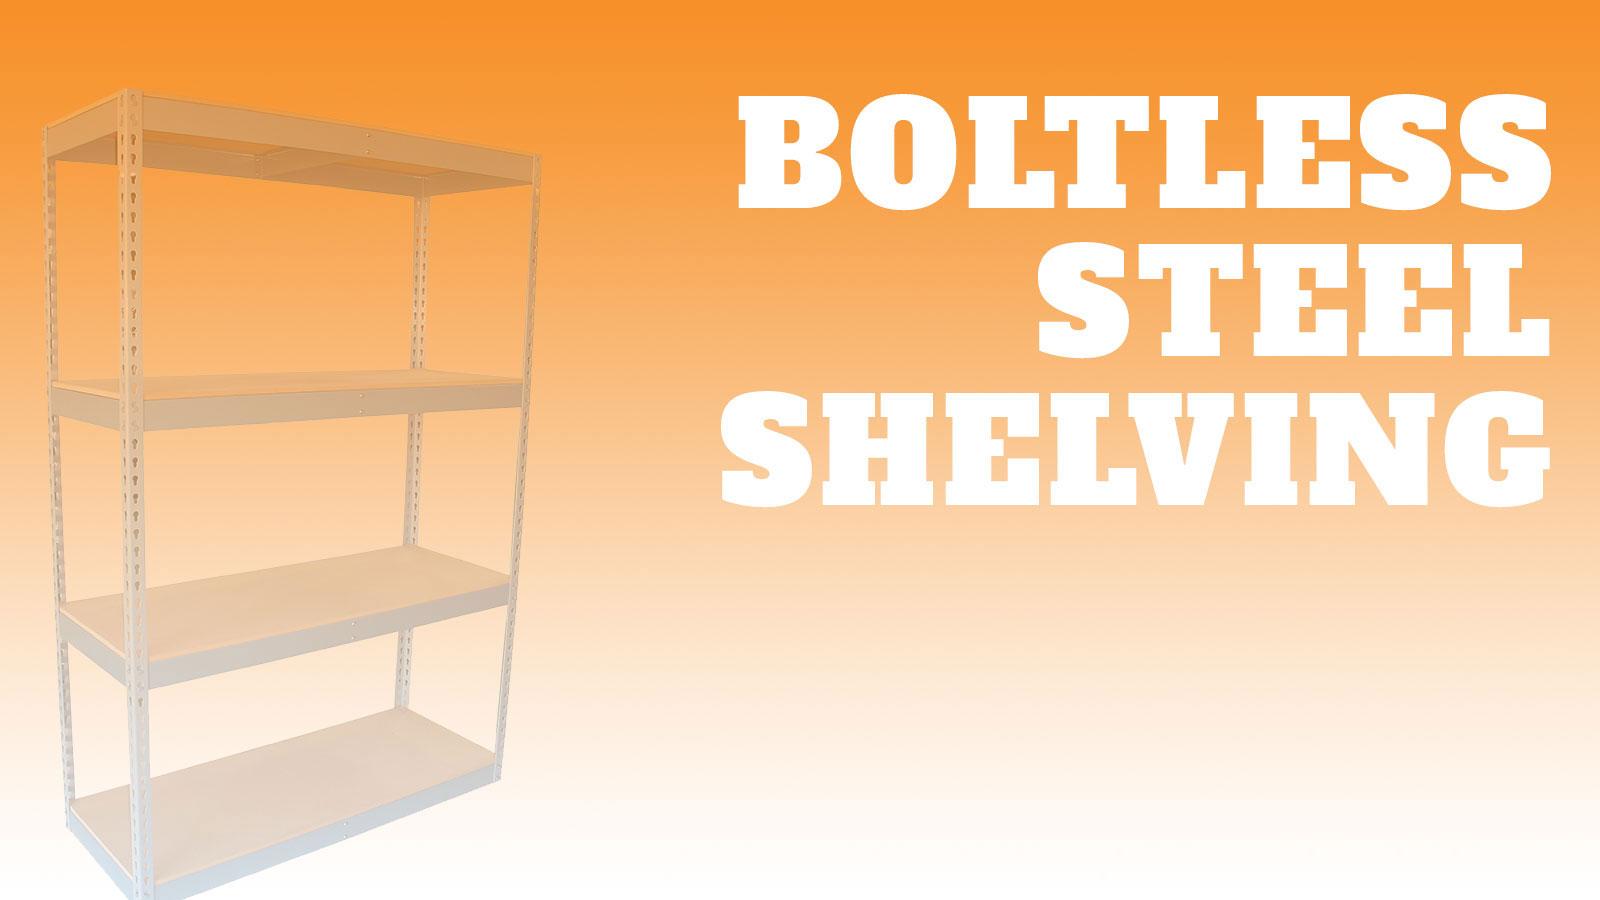 Industrial-Botless-Shelving